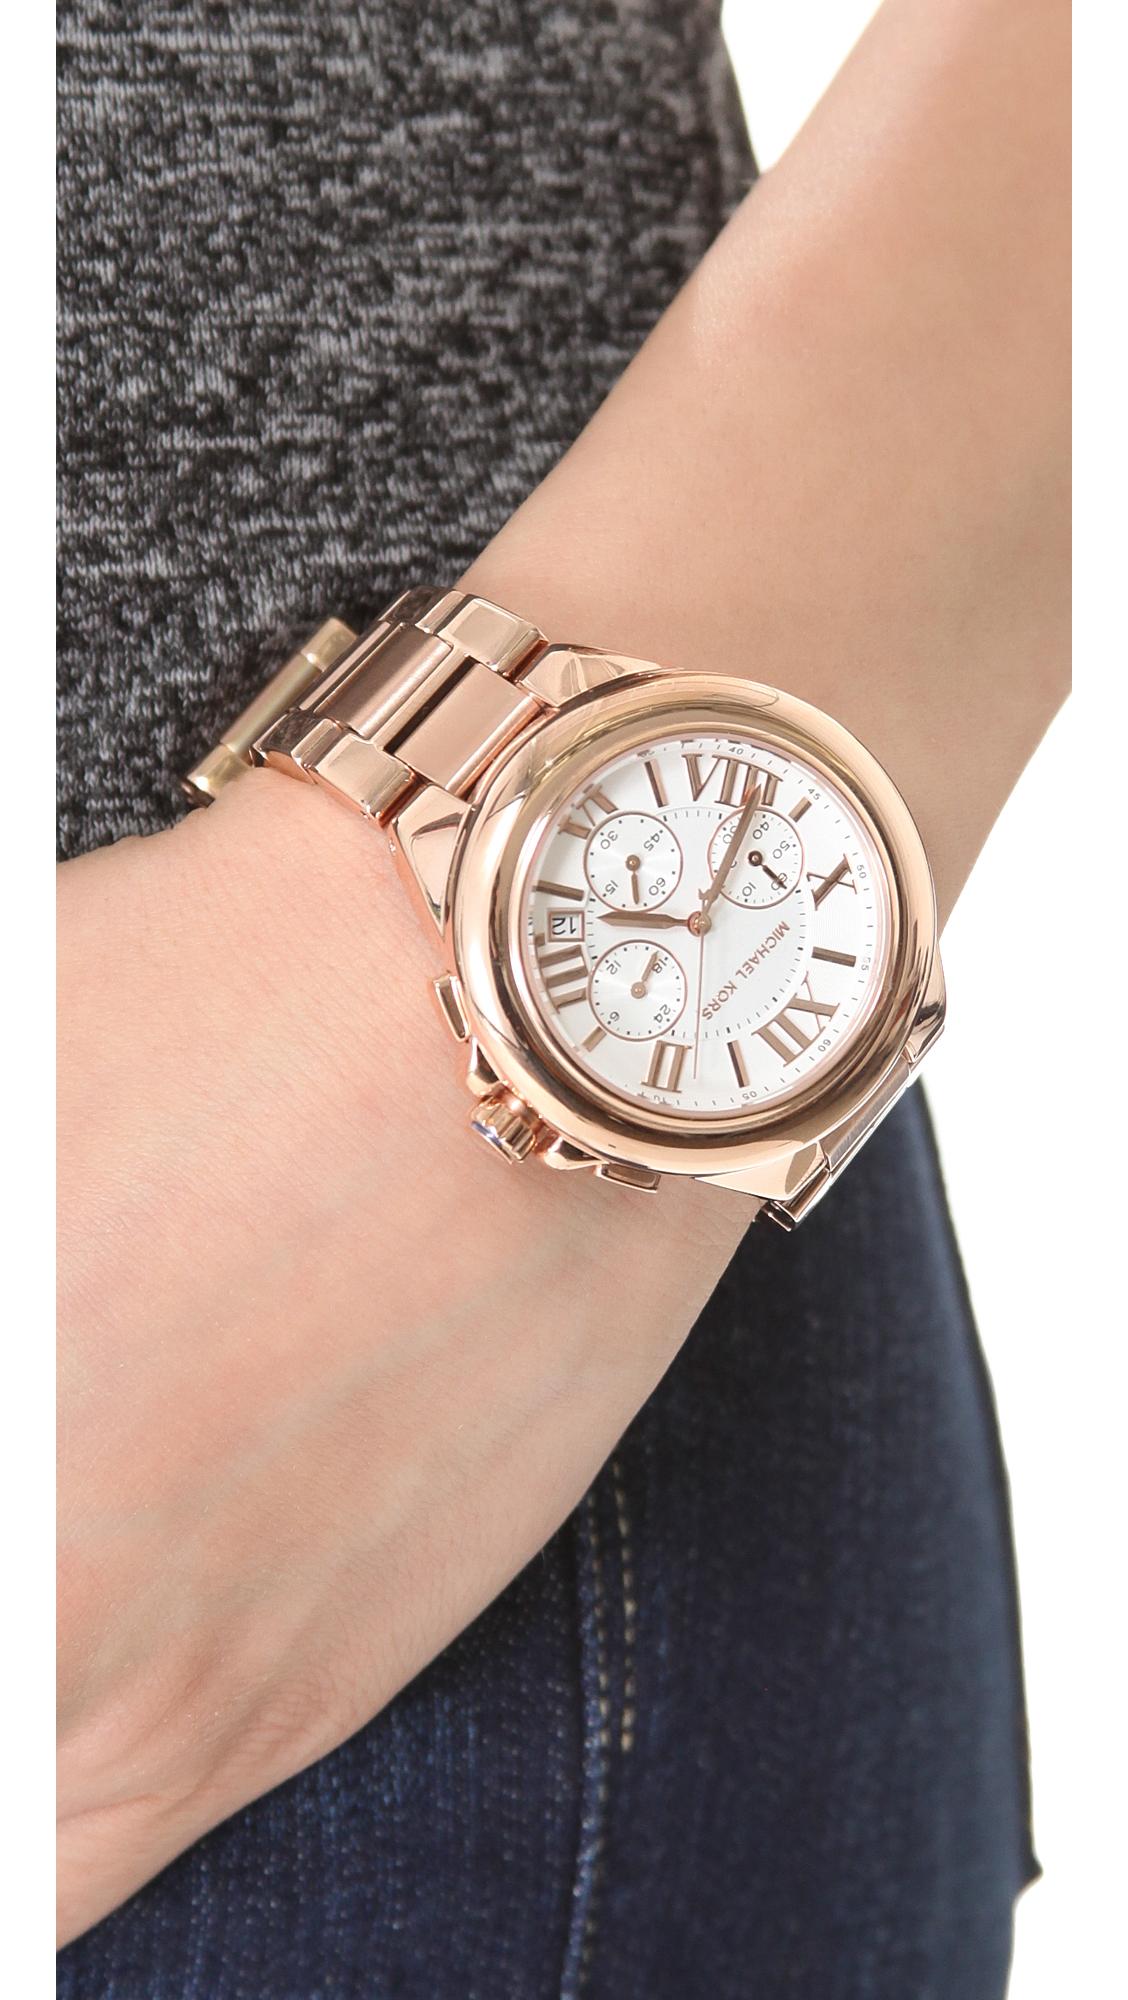 1ba29a5ac5b1 Lyst - Michael Kors Camille Chronograph Watch in Metallic